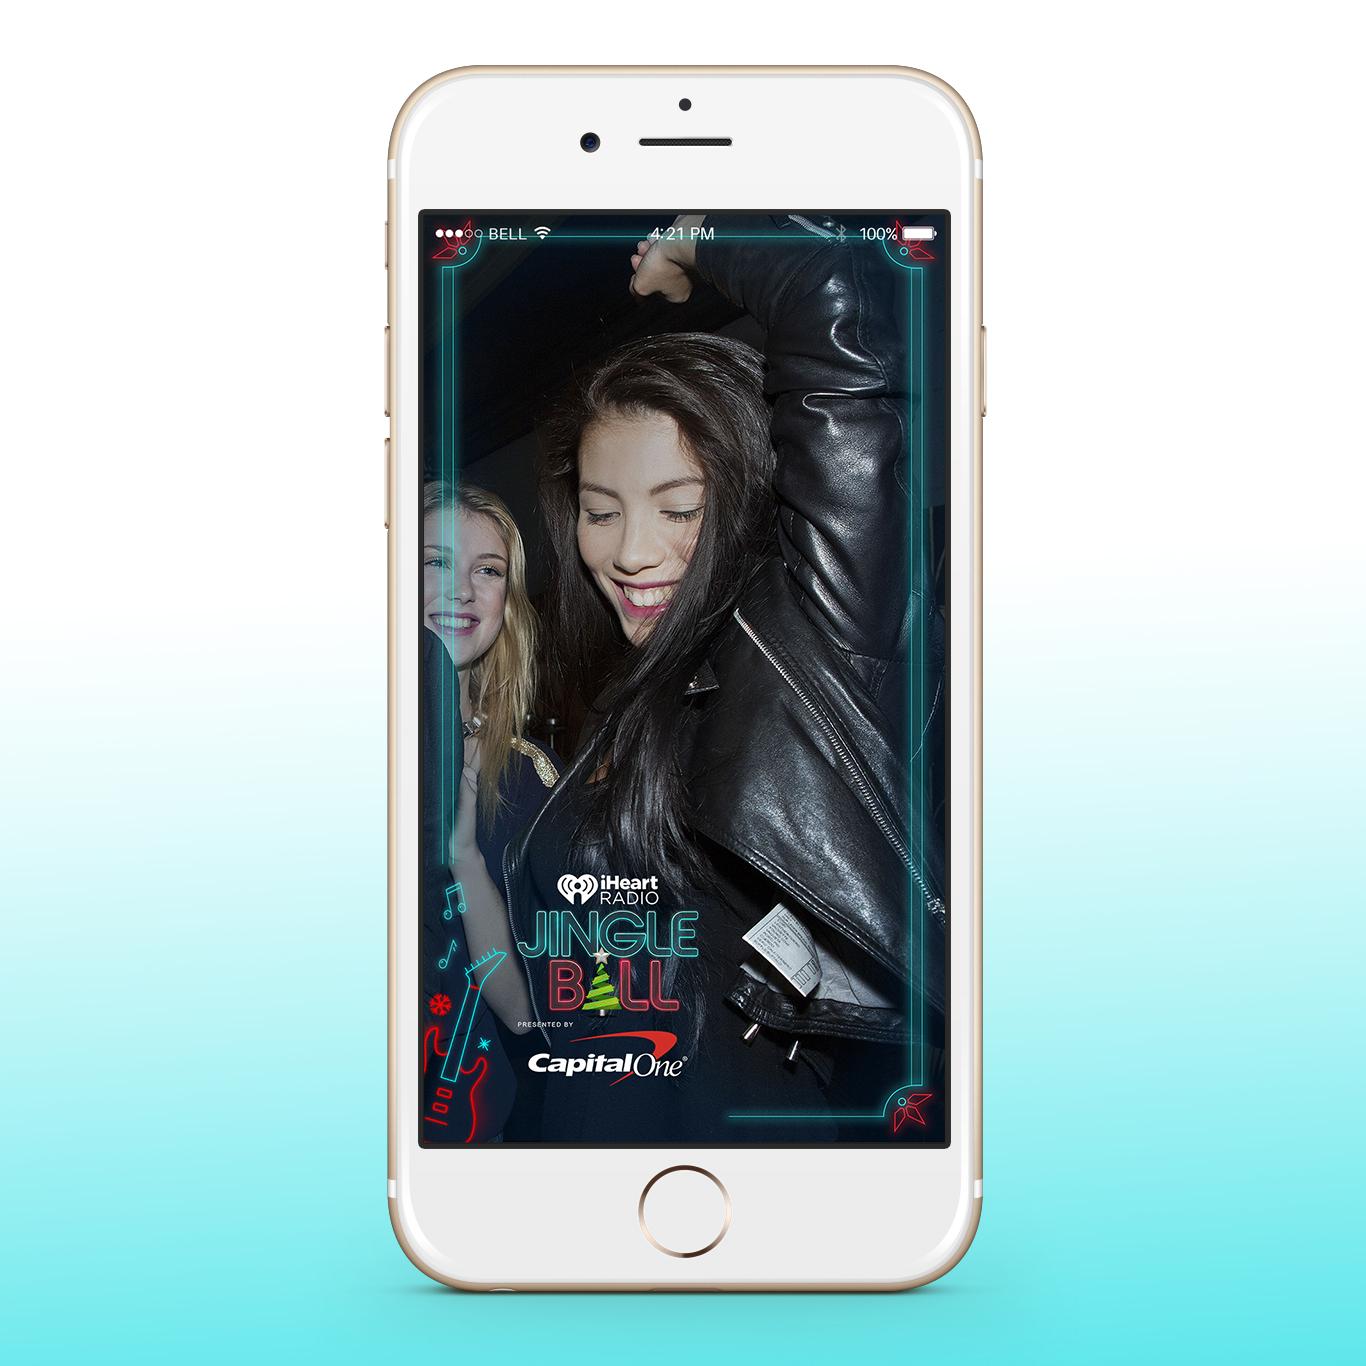 iHeart Jingle Ball Snapchat Filters - Final